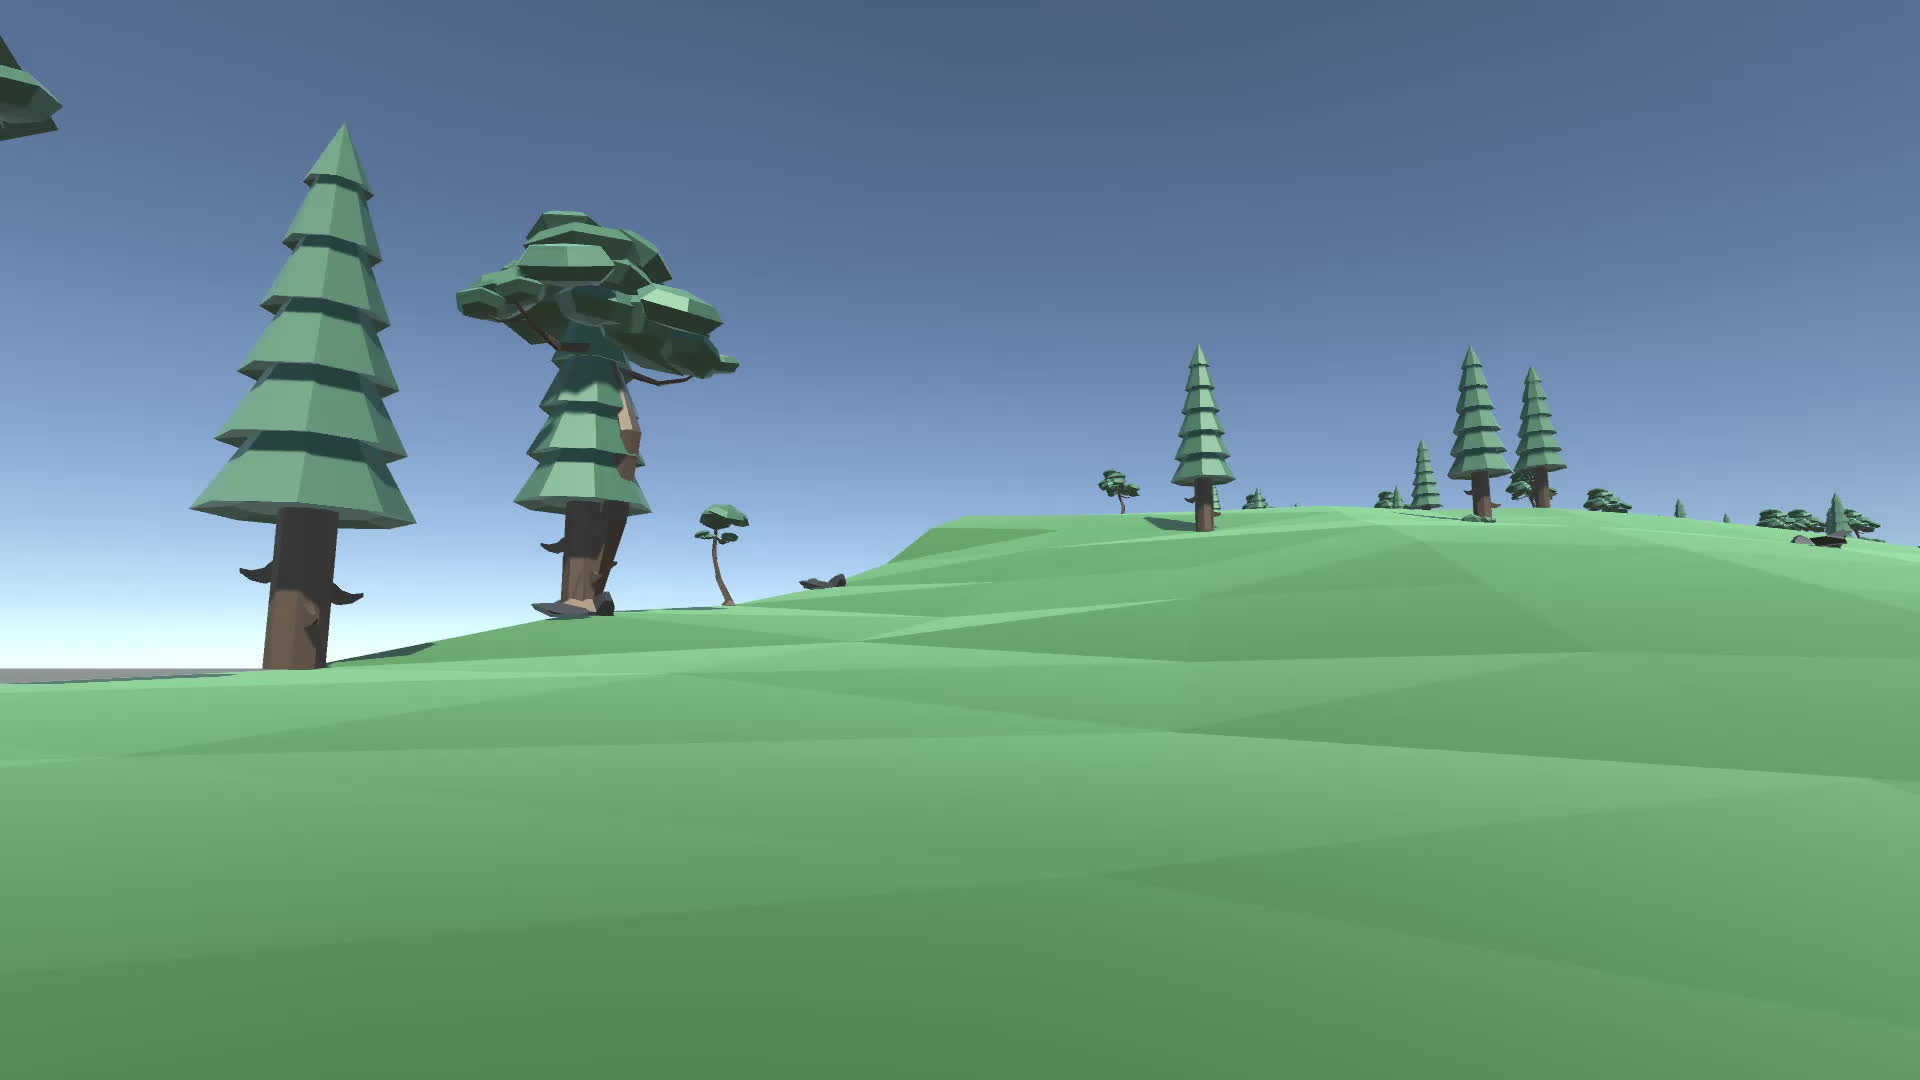 proceduralgeneration, terrain, Low poly terrain Unity3D GIFs